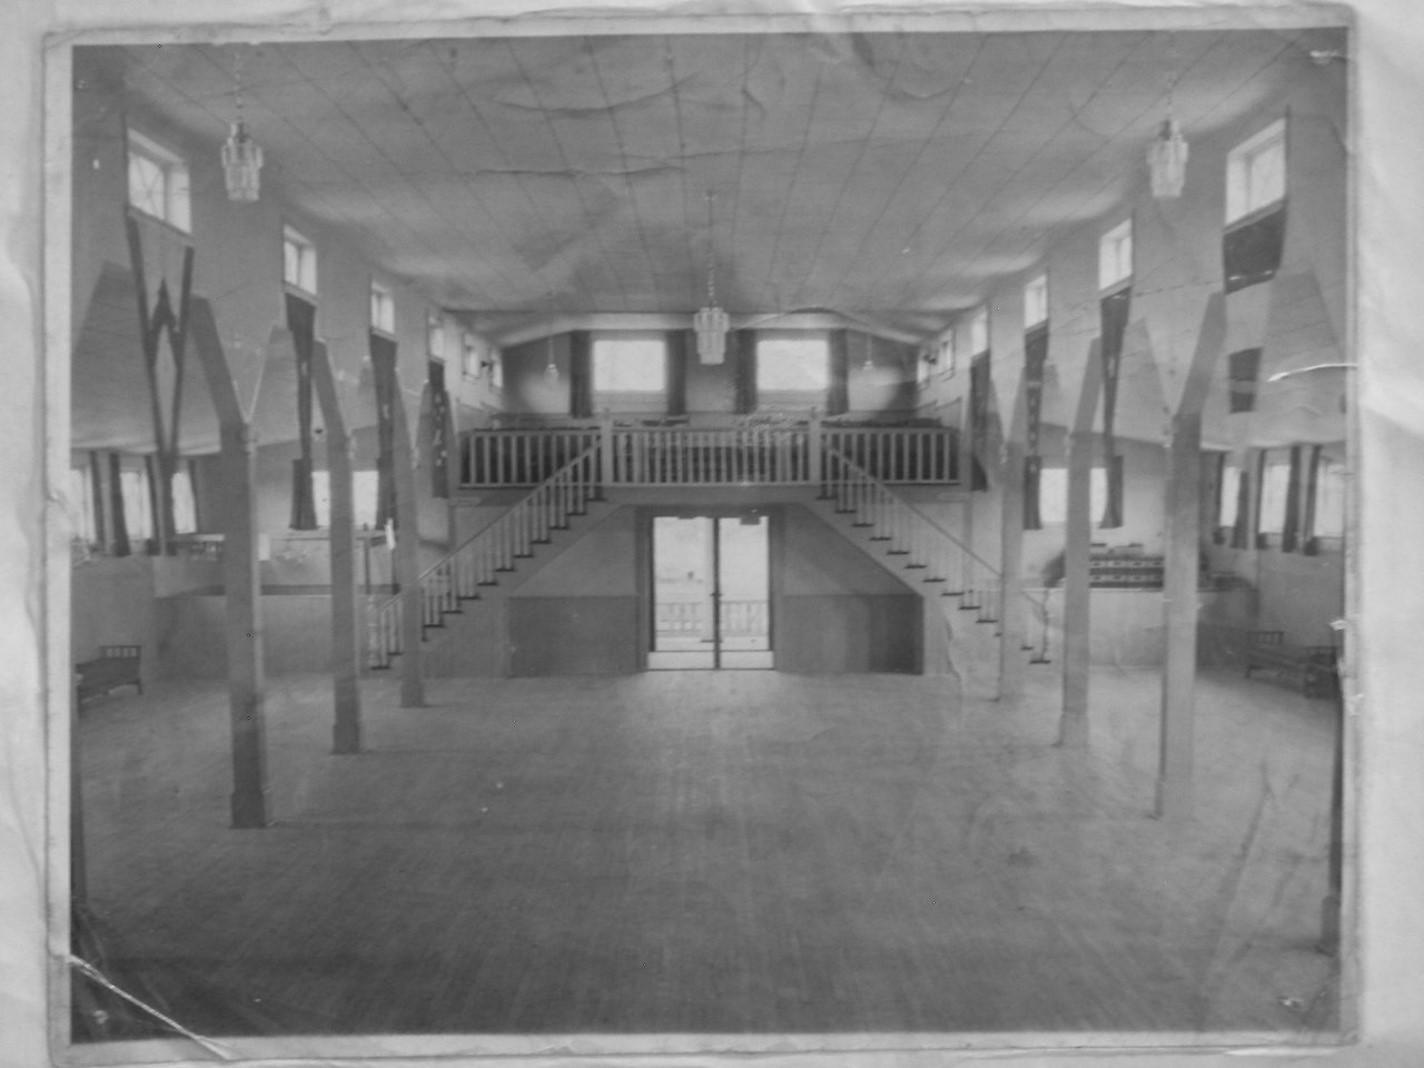 Inside photo of The Barn